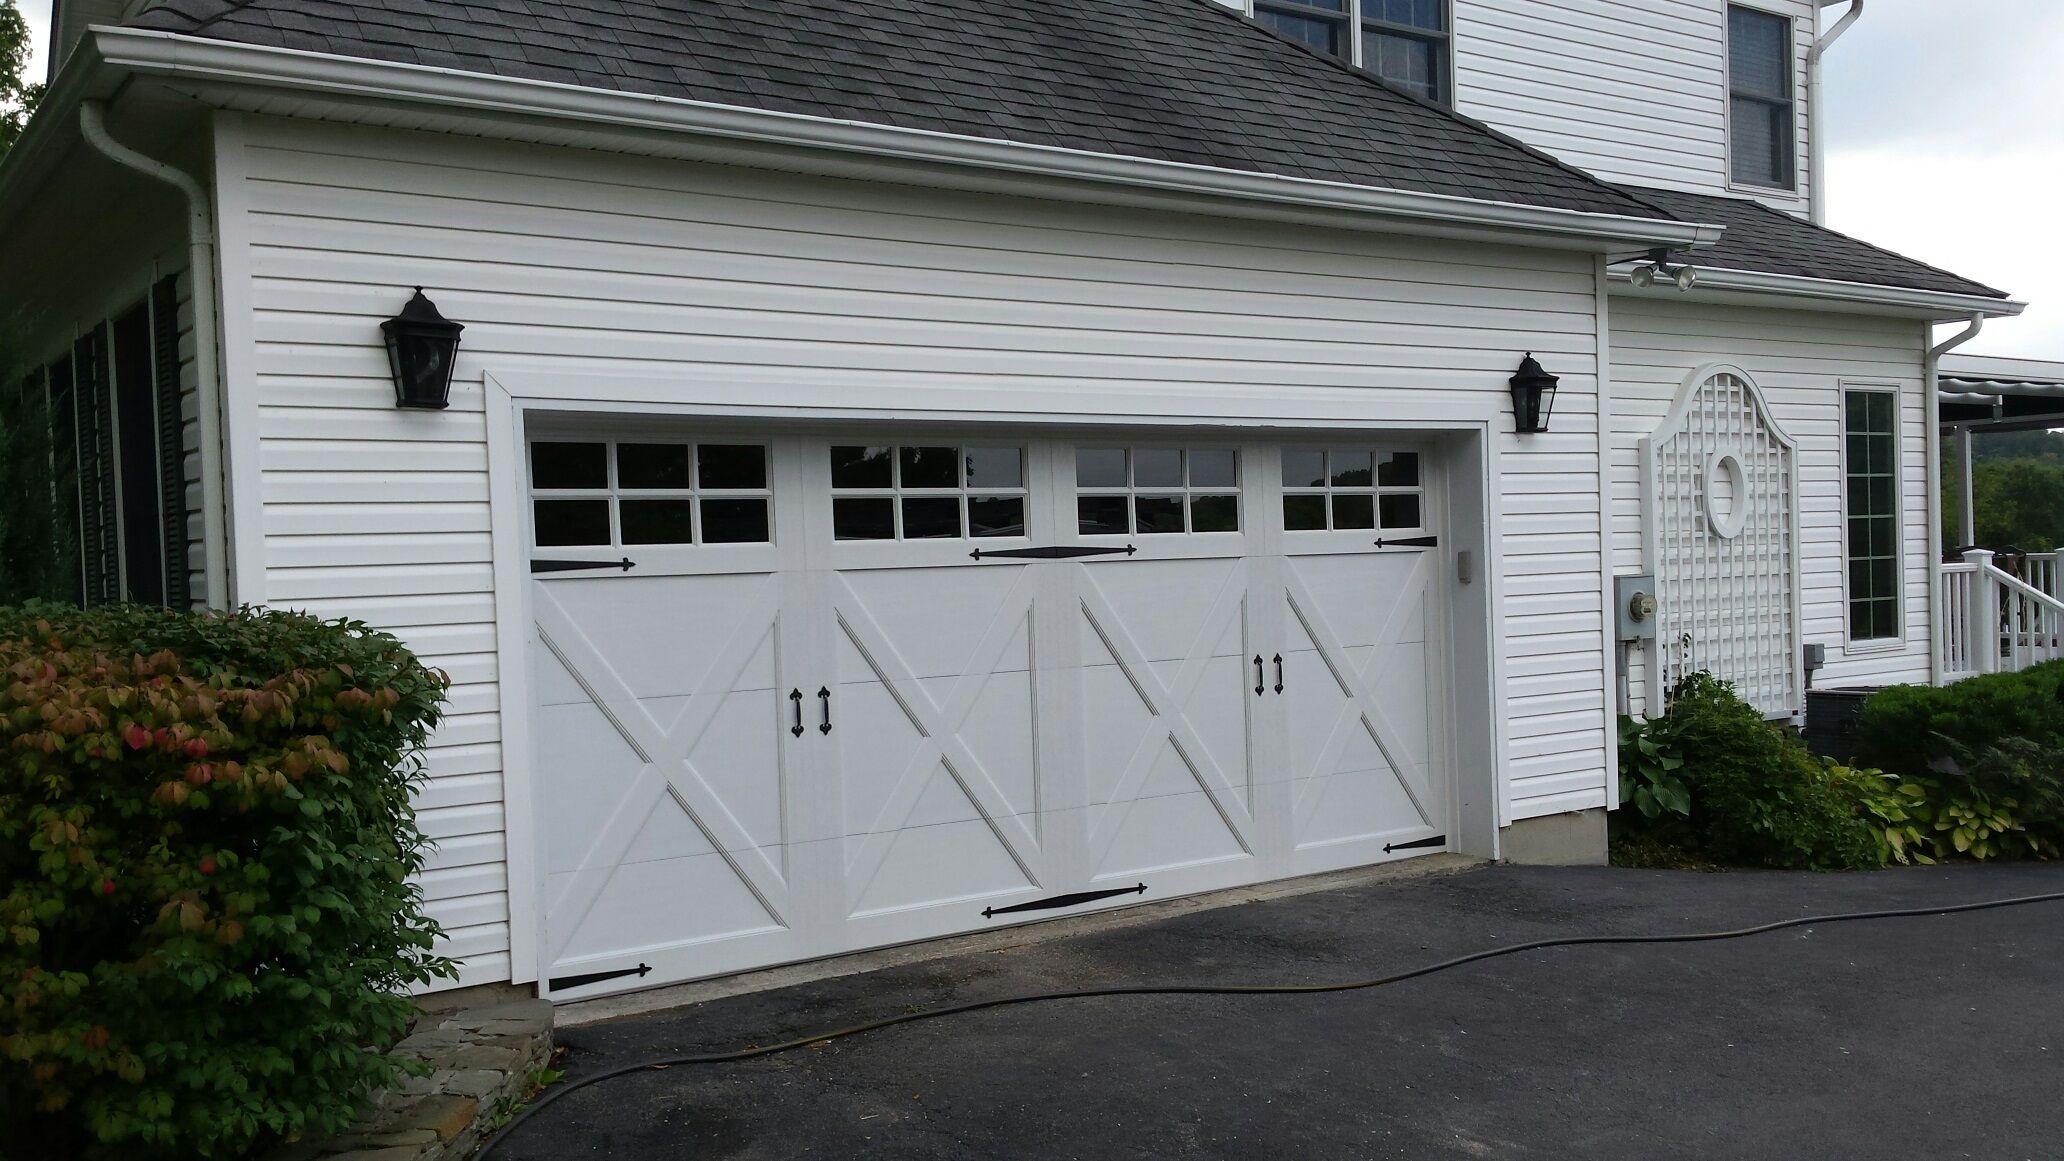 alumview rail raynor by stile sectional door catalogs doors commercial alumaview garage